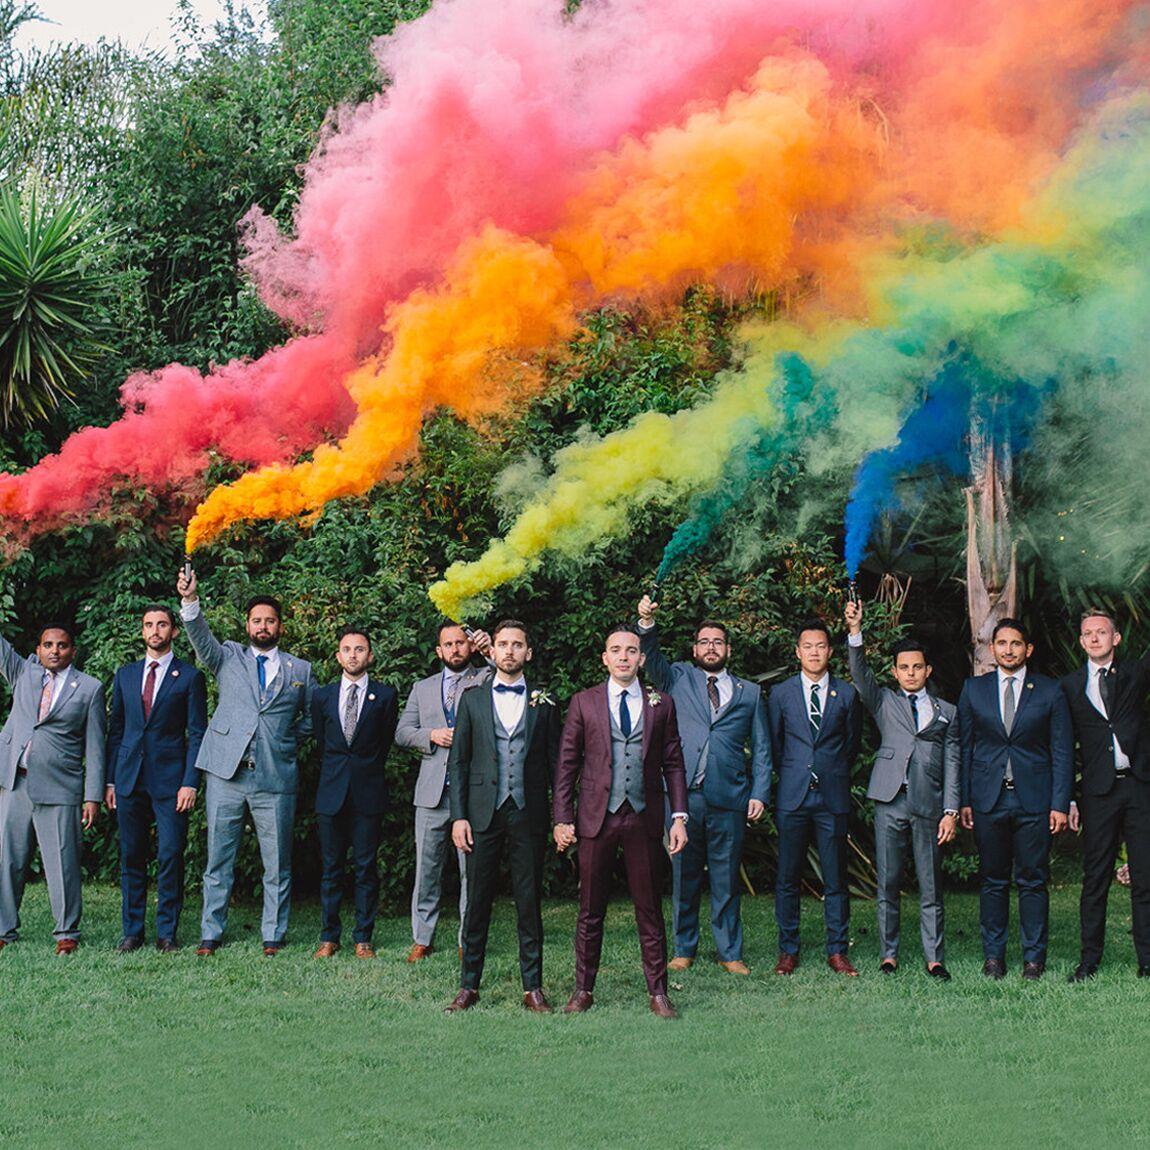 rainbow smoke bombs